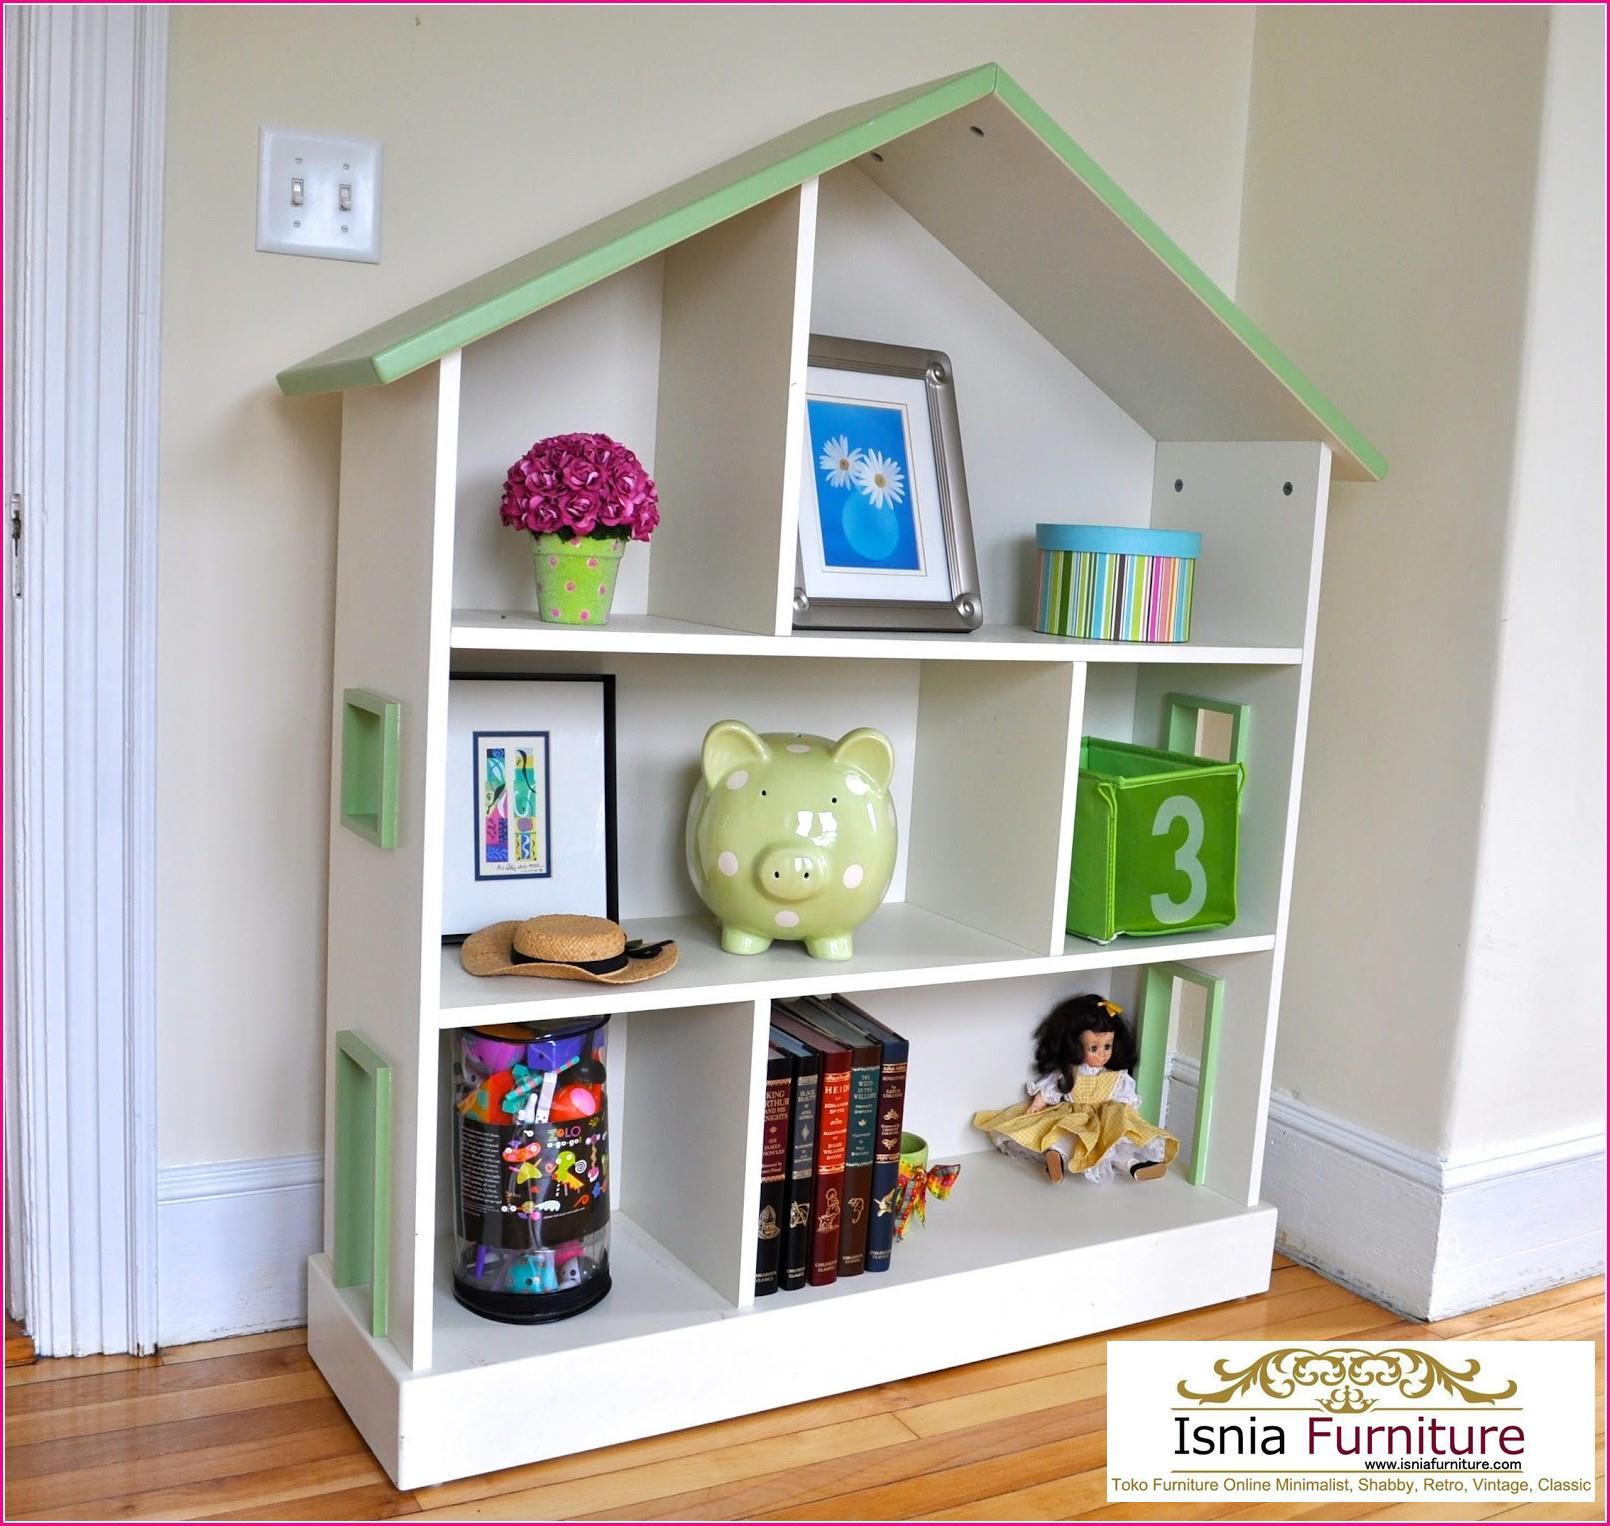 Lemari Buku Anak Bahan Kayu Jati Minimalis Bentuk Rumah